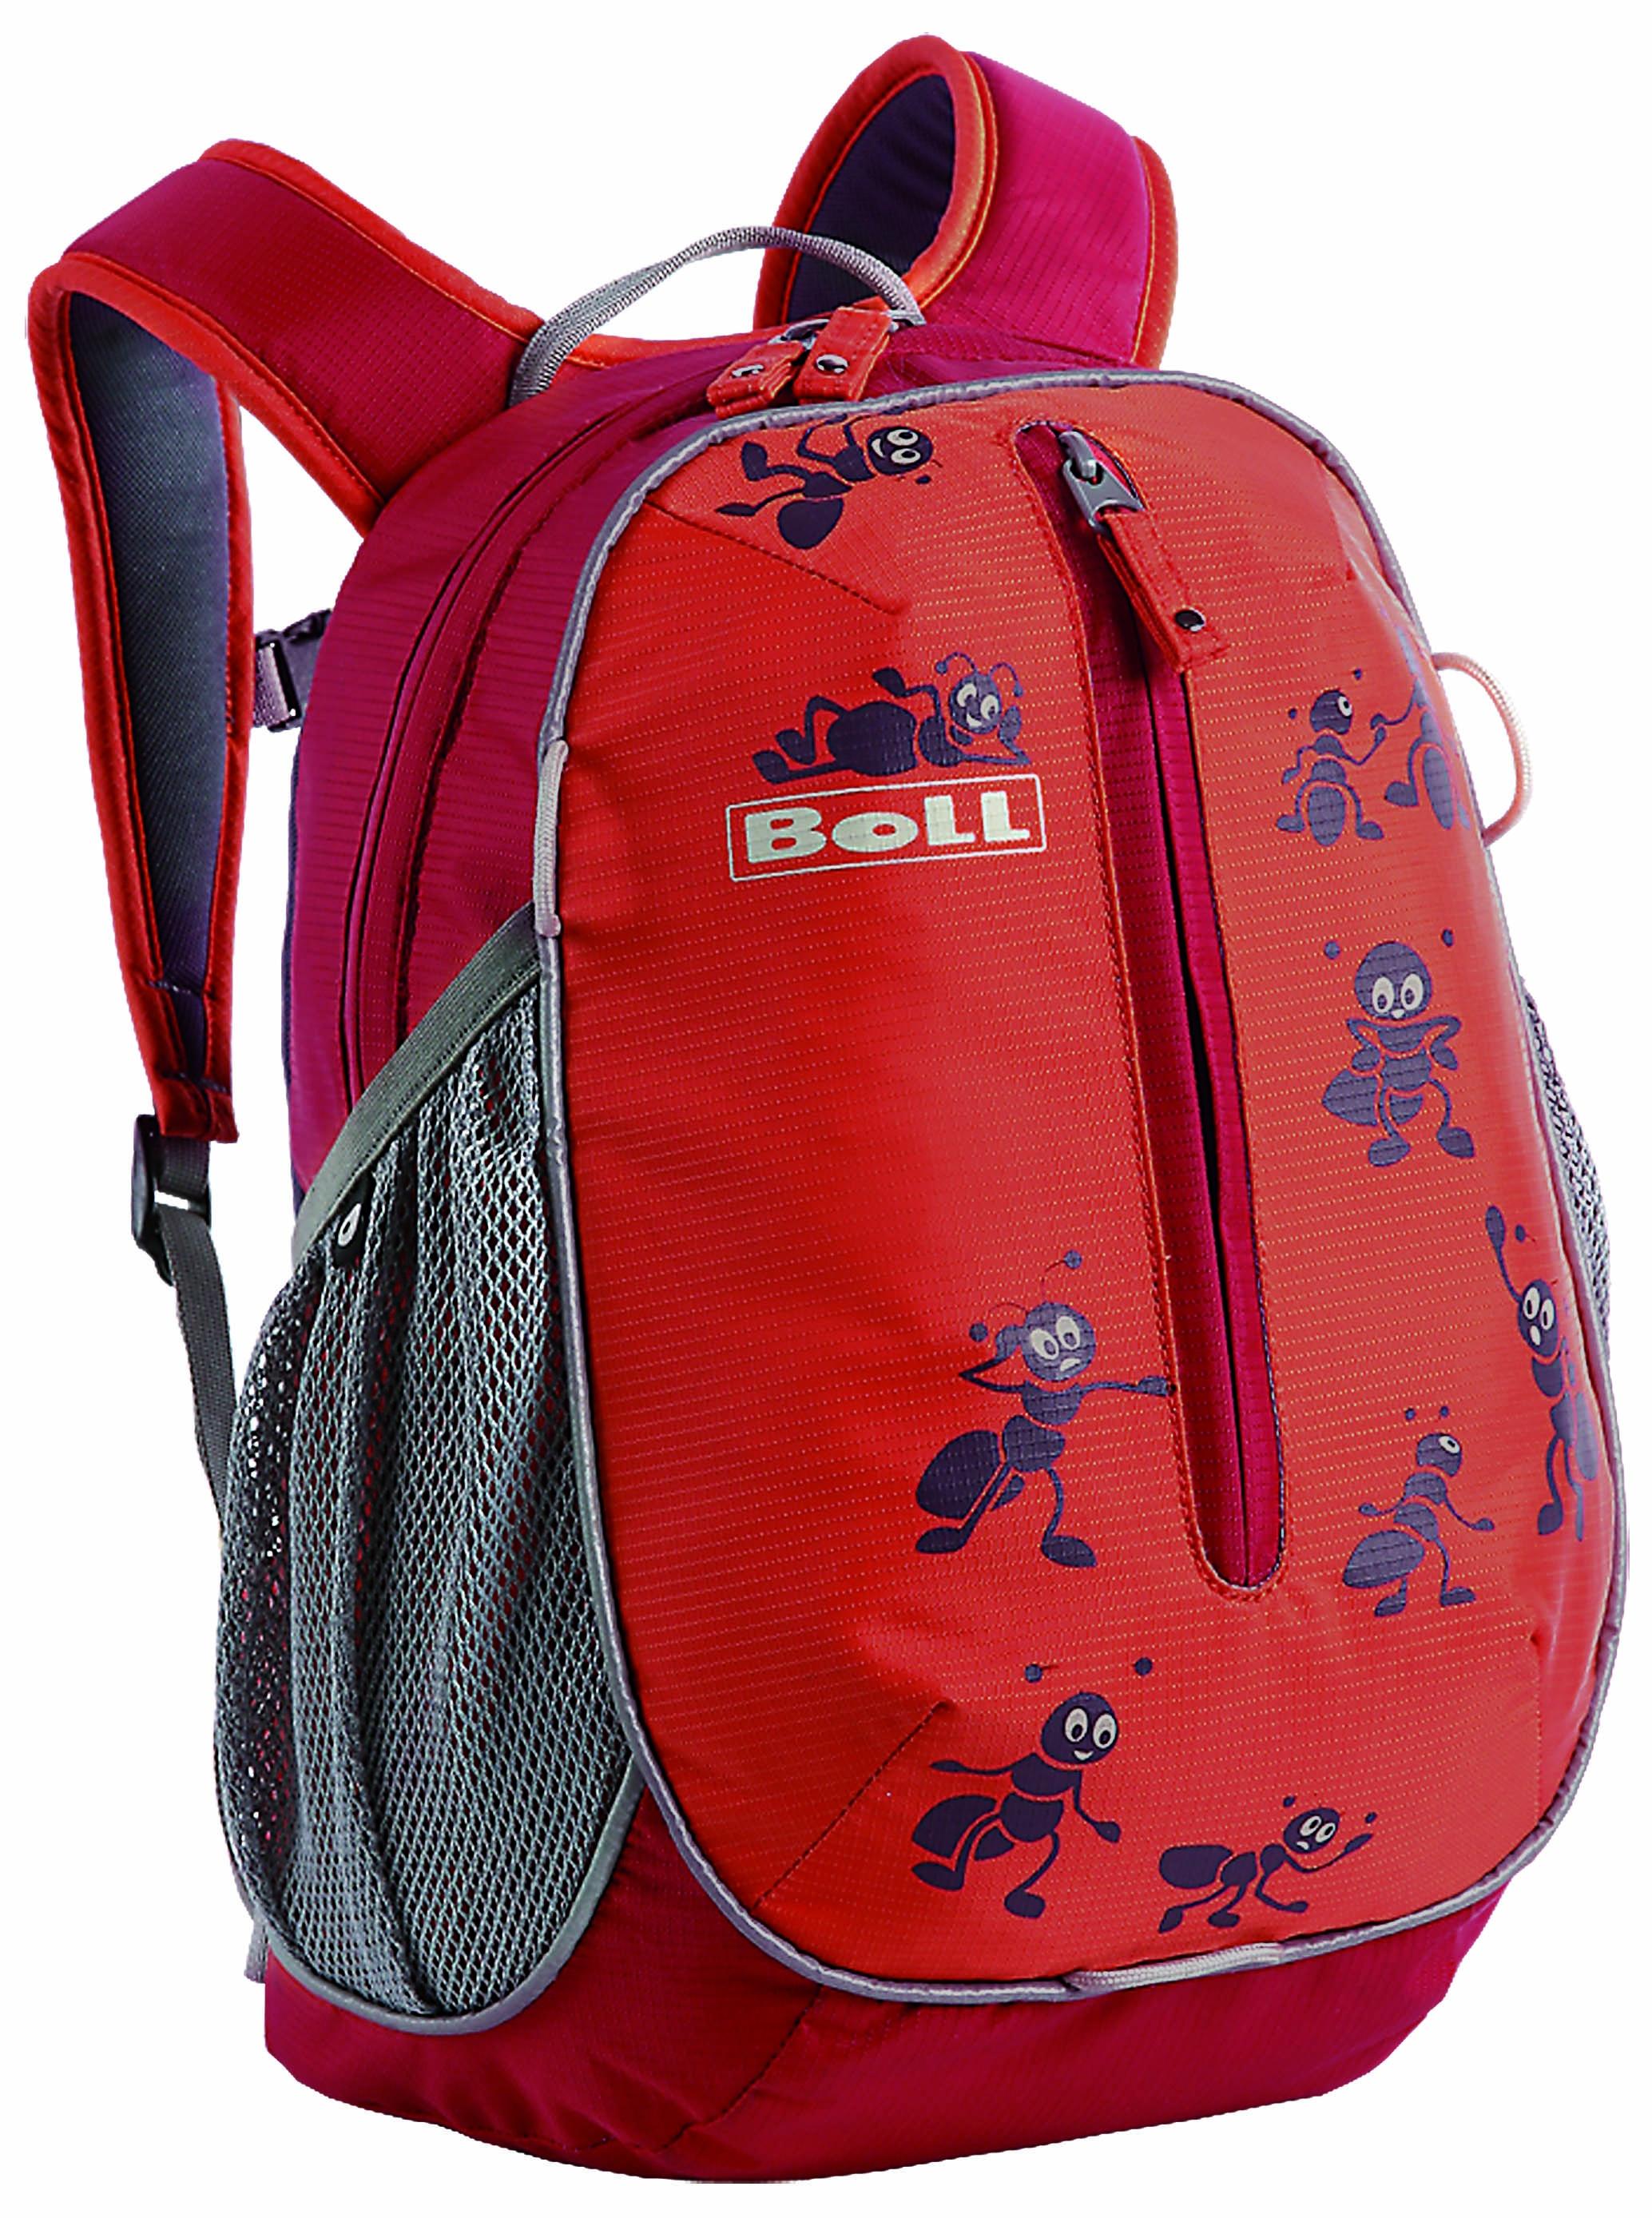 dětský batoh Boll Roo true red